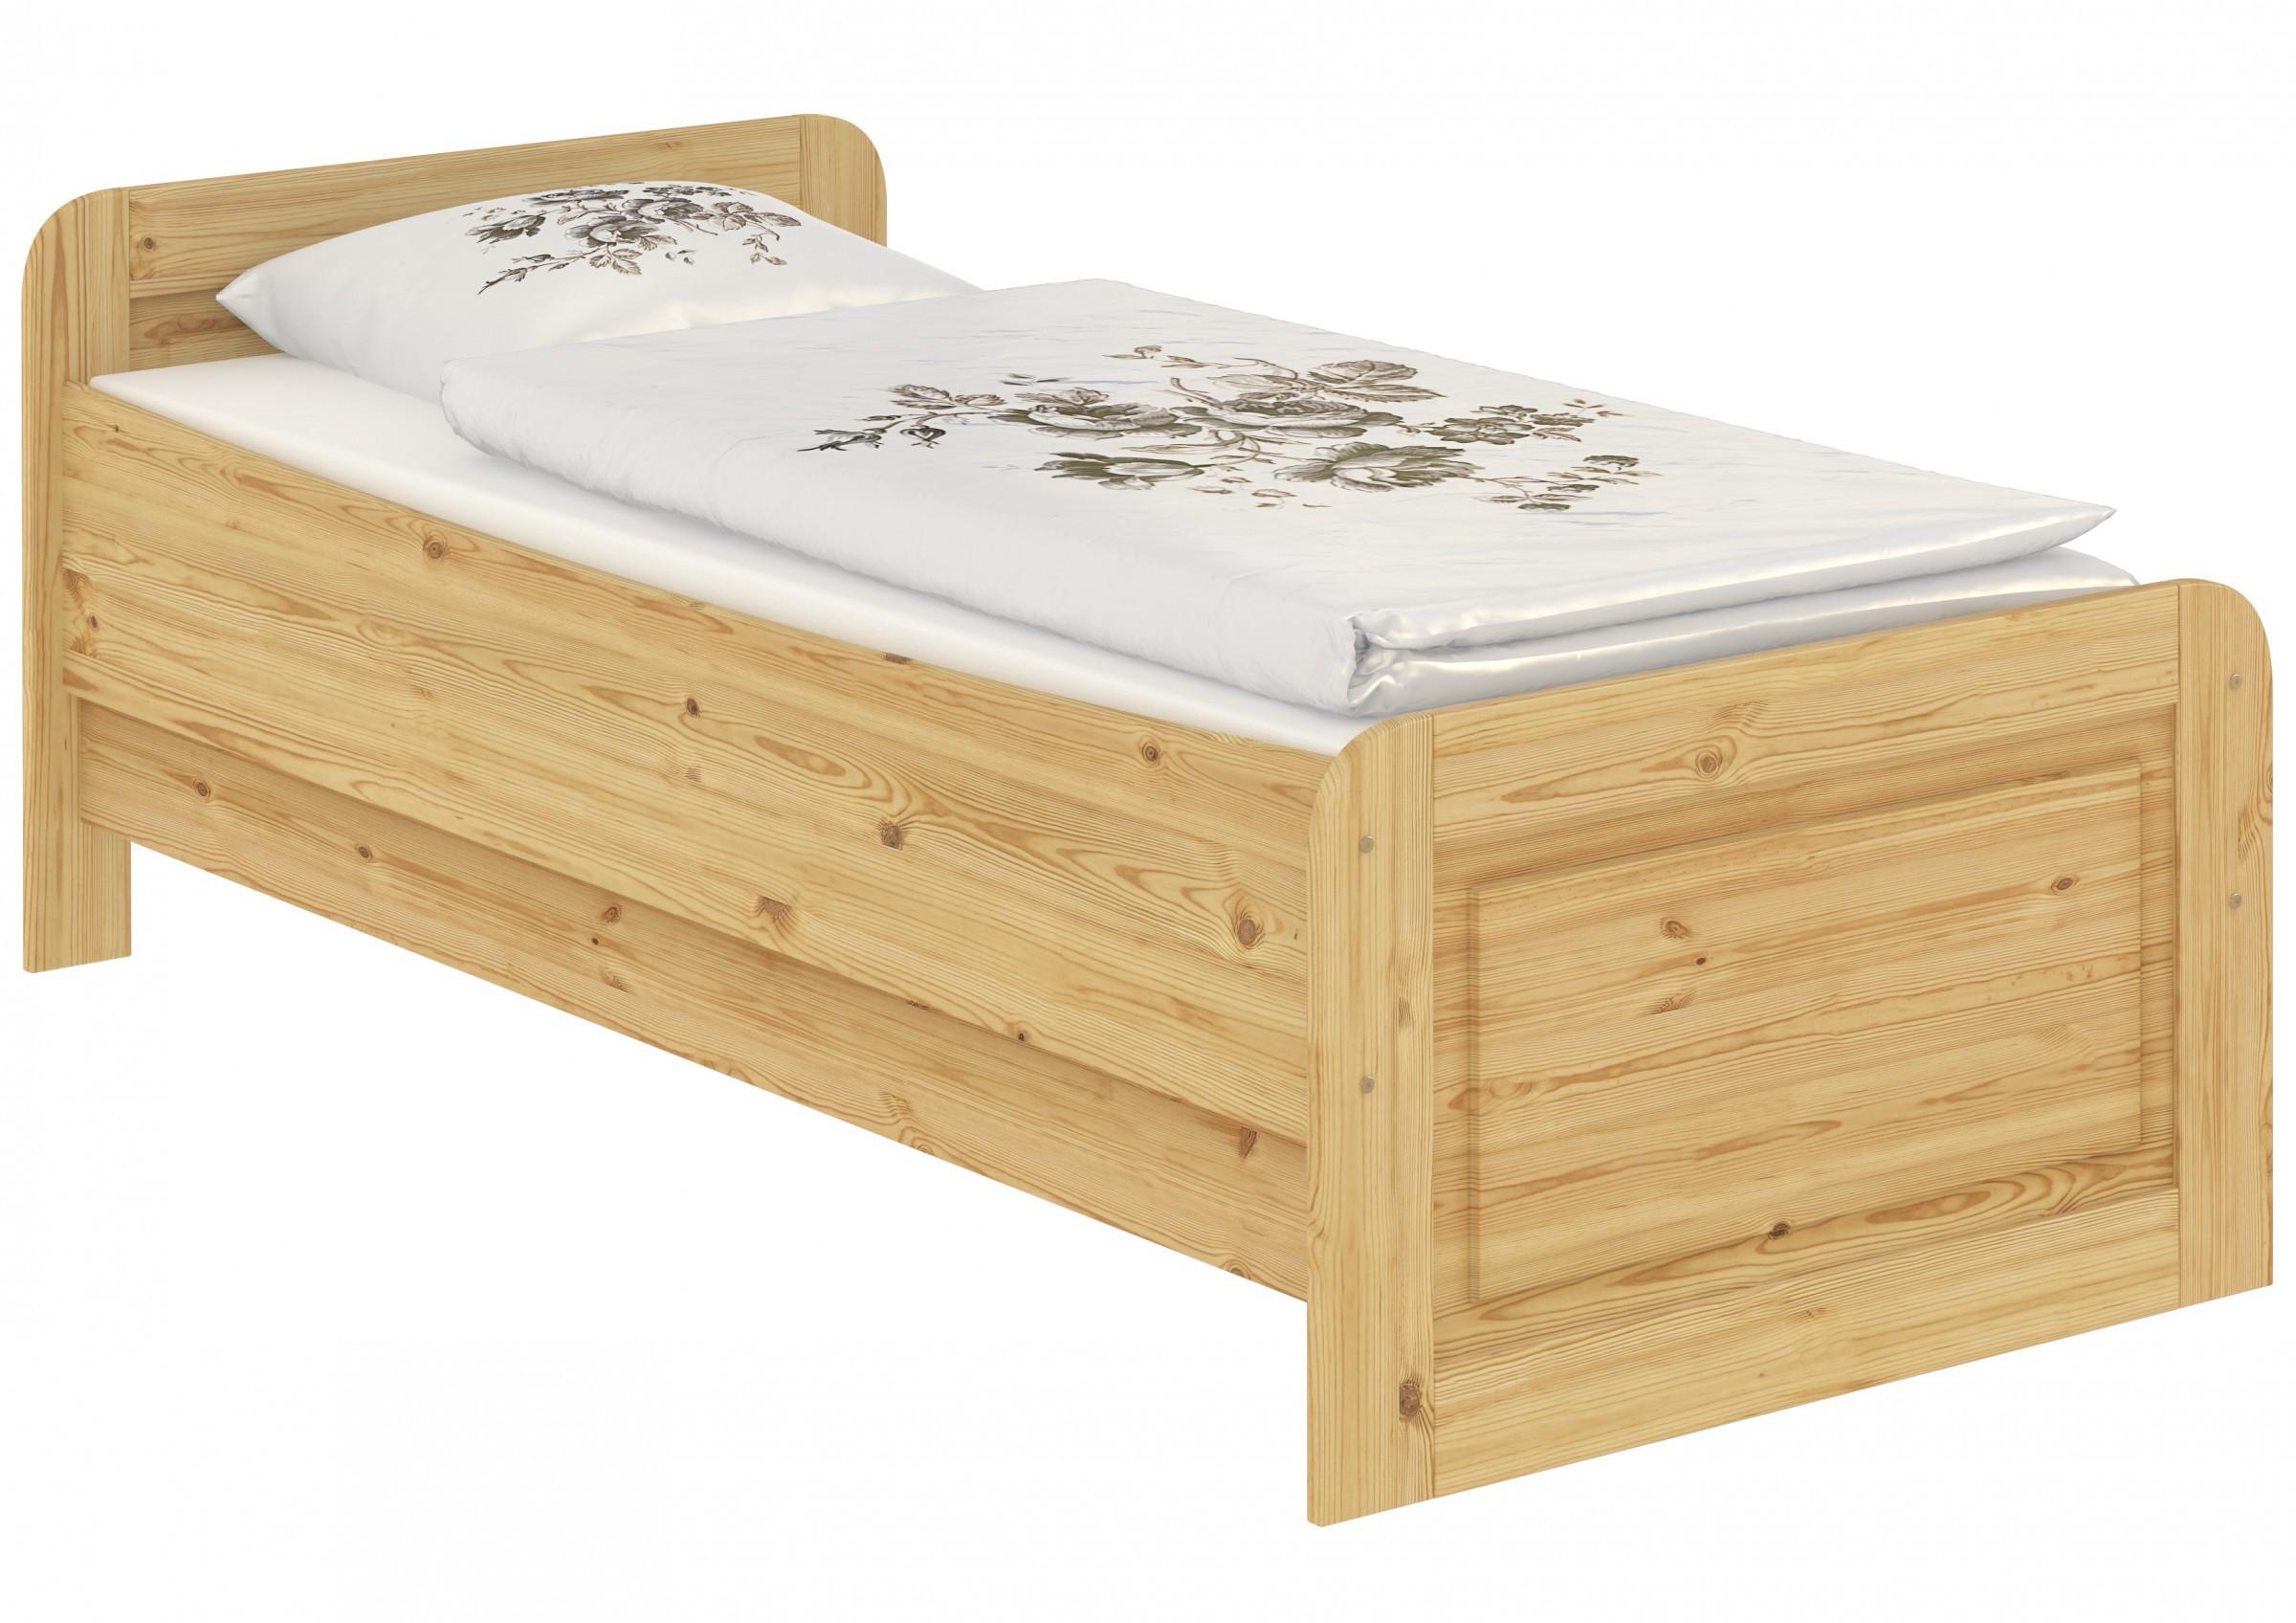 Seniorenbett Extra Hoch 100x220 Einzelbett Holzbett